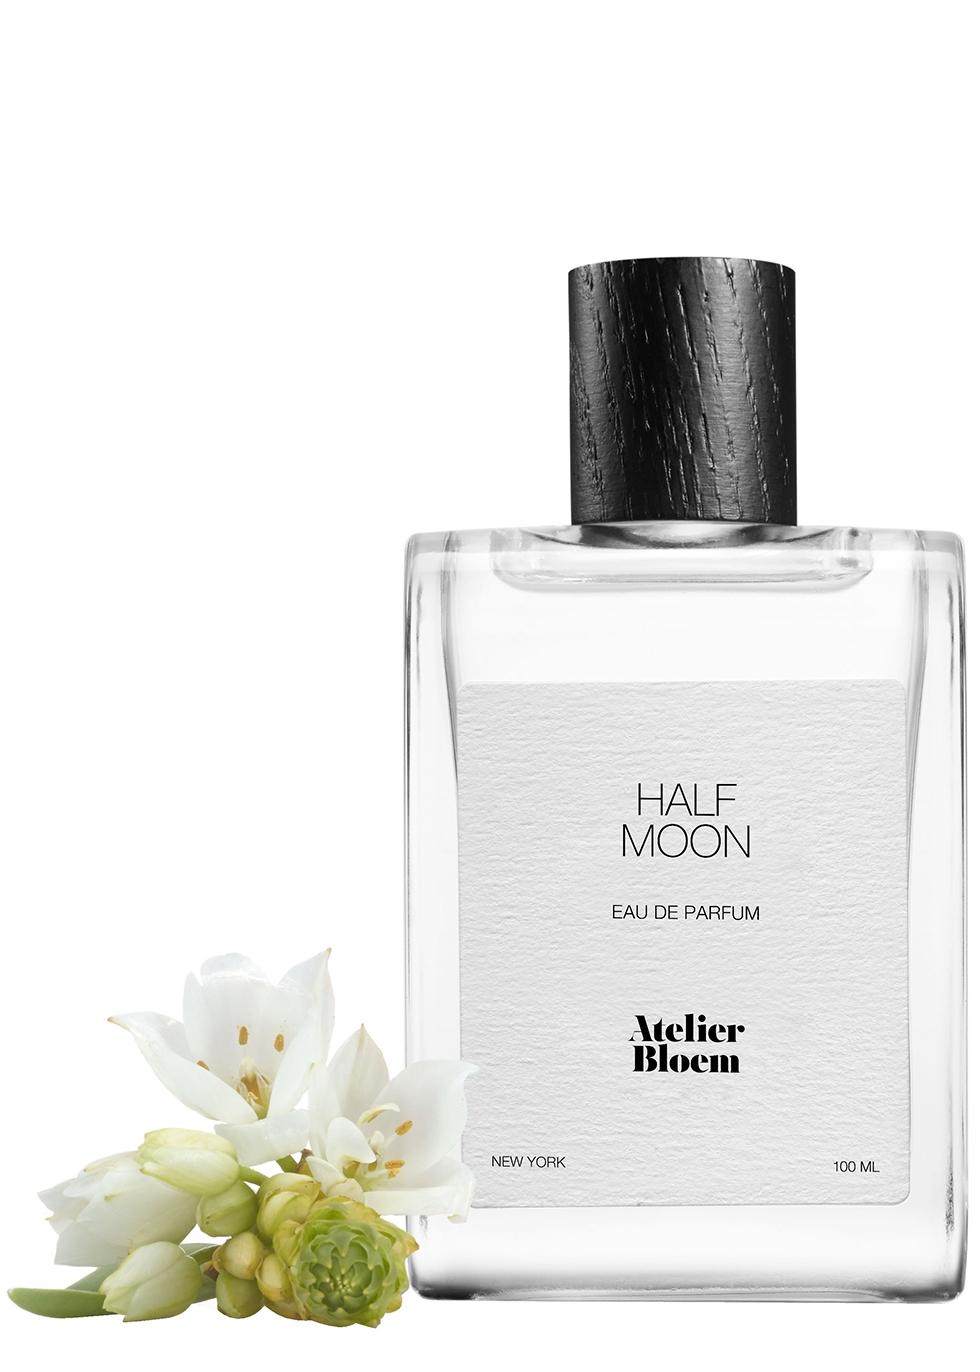 Half Moon Eau De Parfum 100ml - ATELIER BLOEM